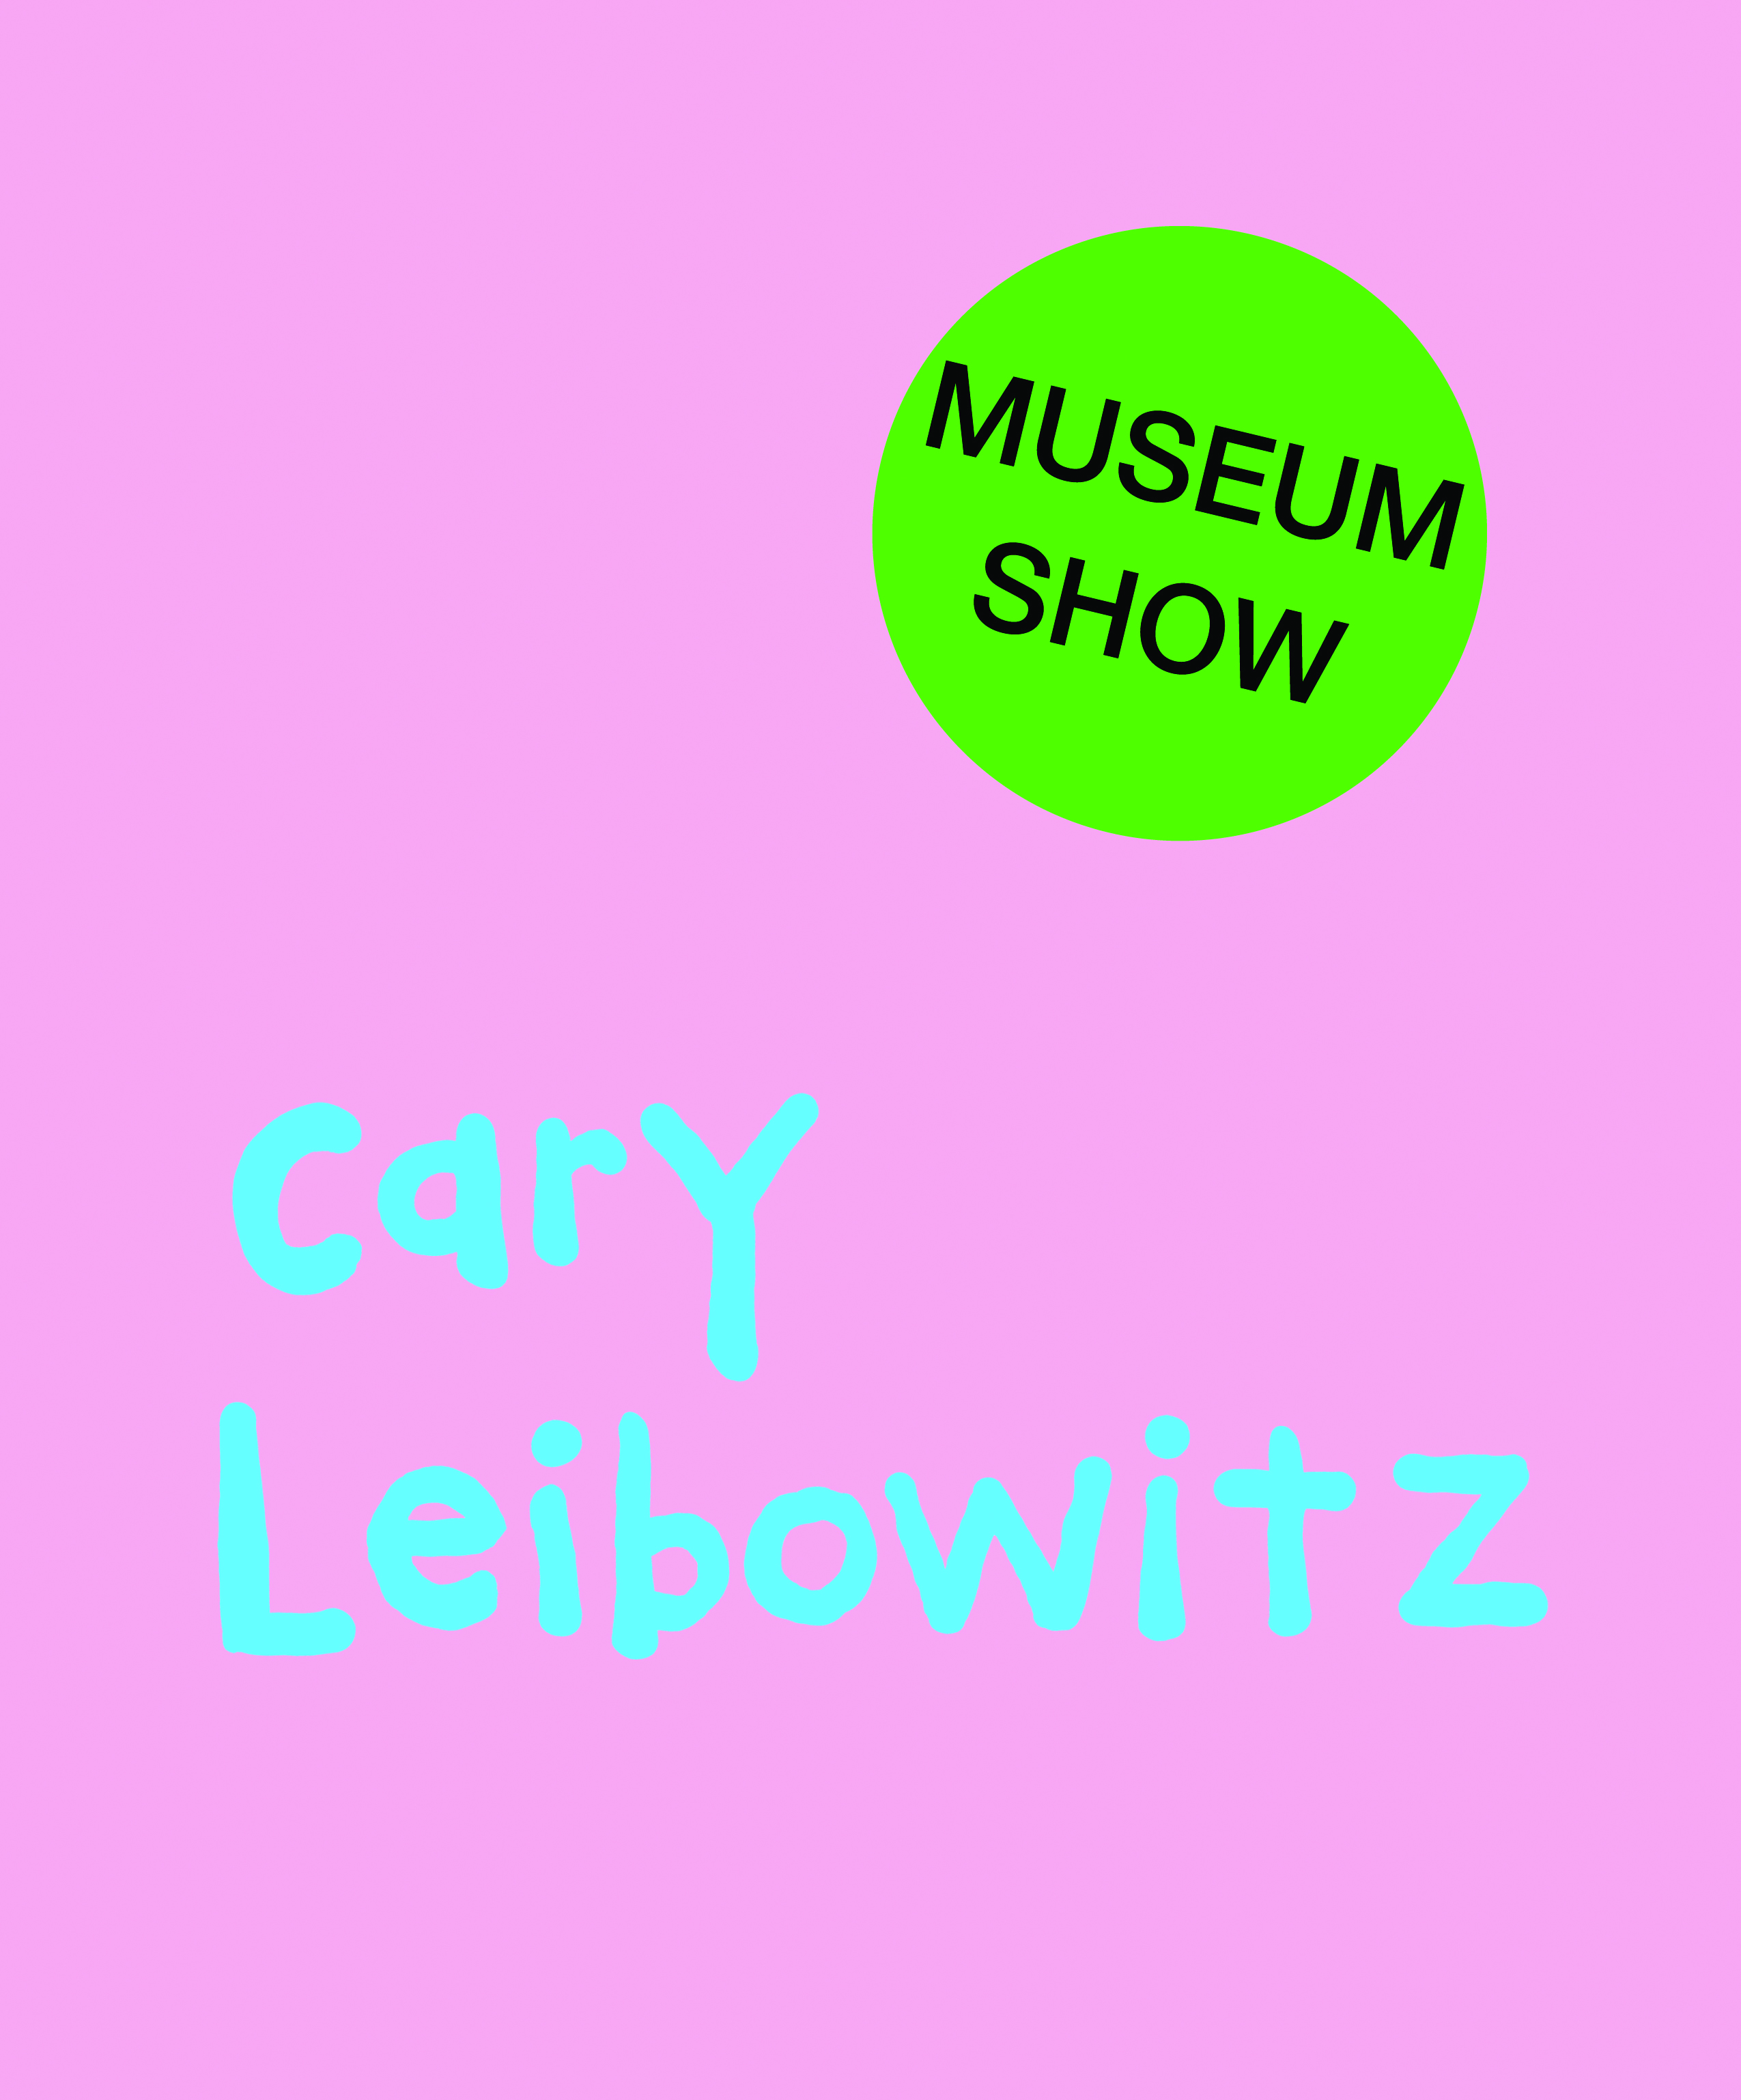 Cary Leibowitz Museum Show catalog